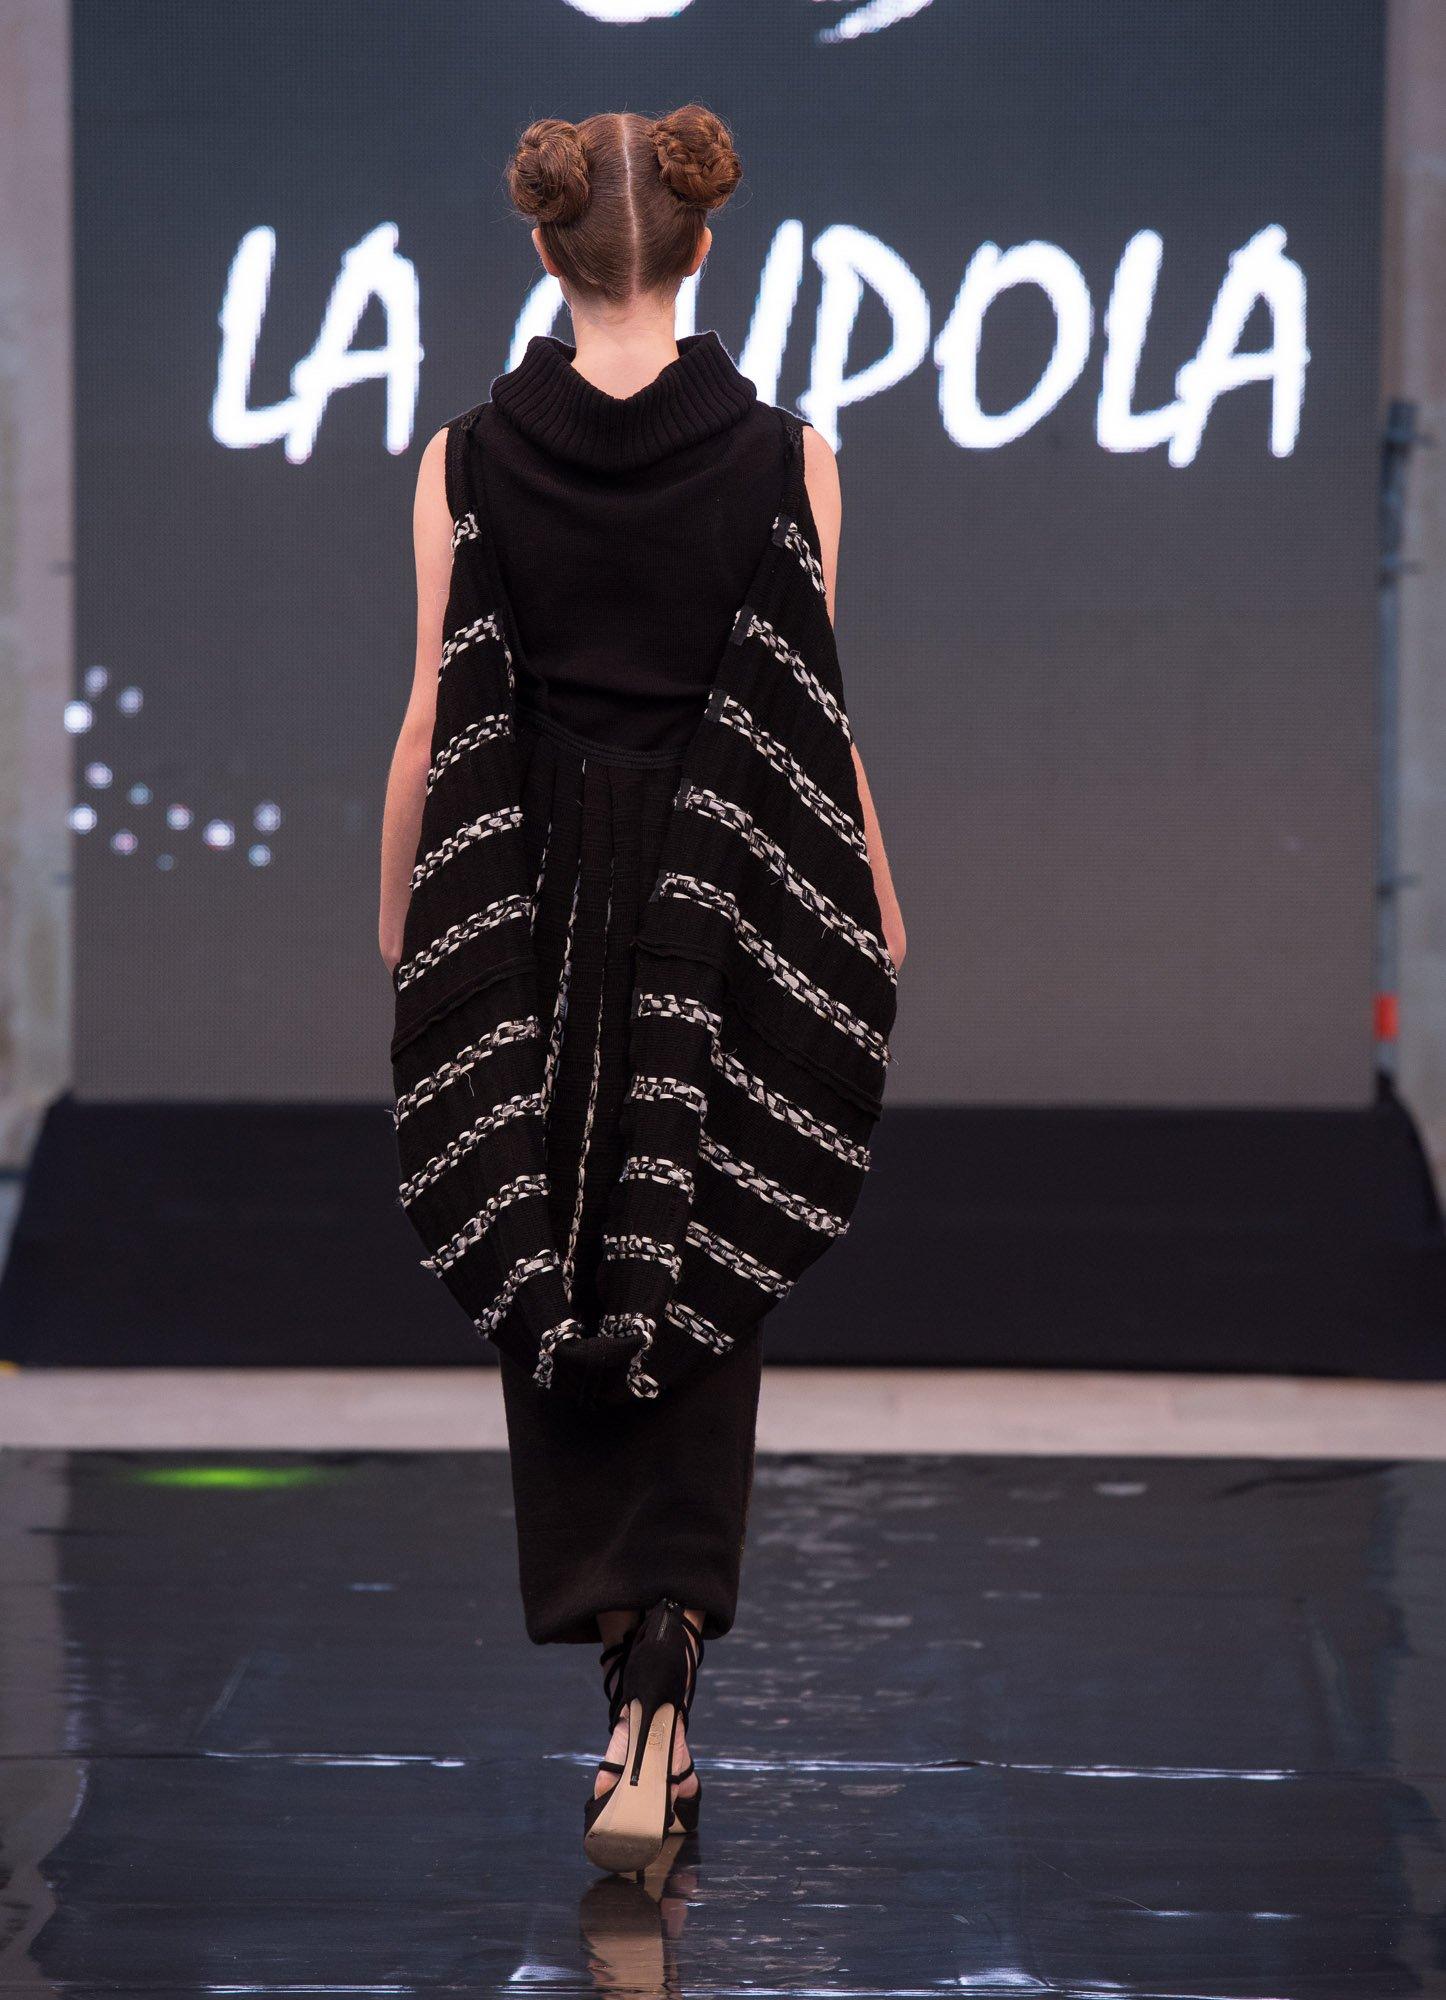 Rosemarie Abela La Cupola Malta Fashion Week Awards